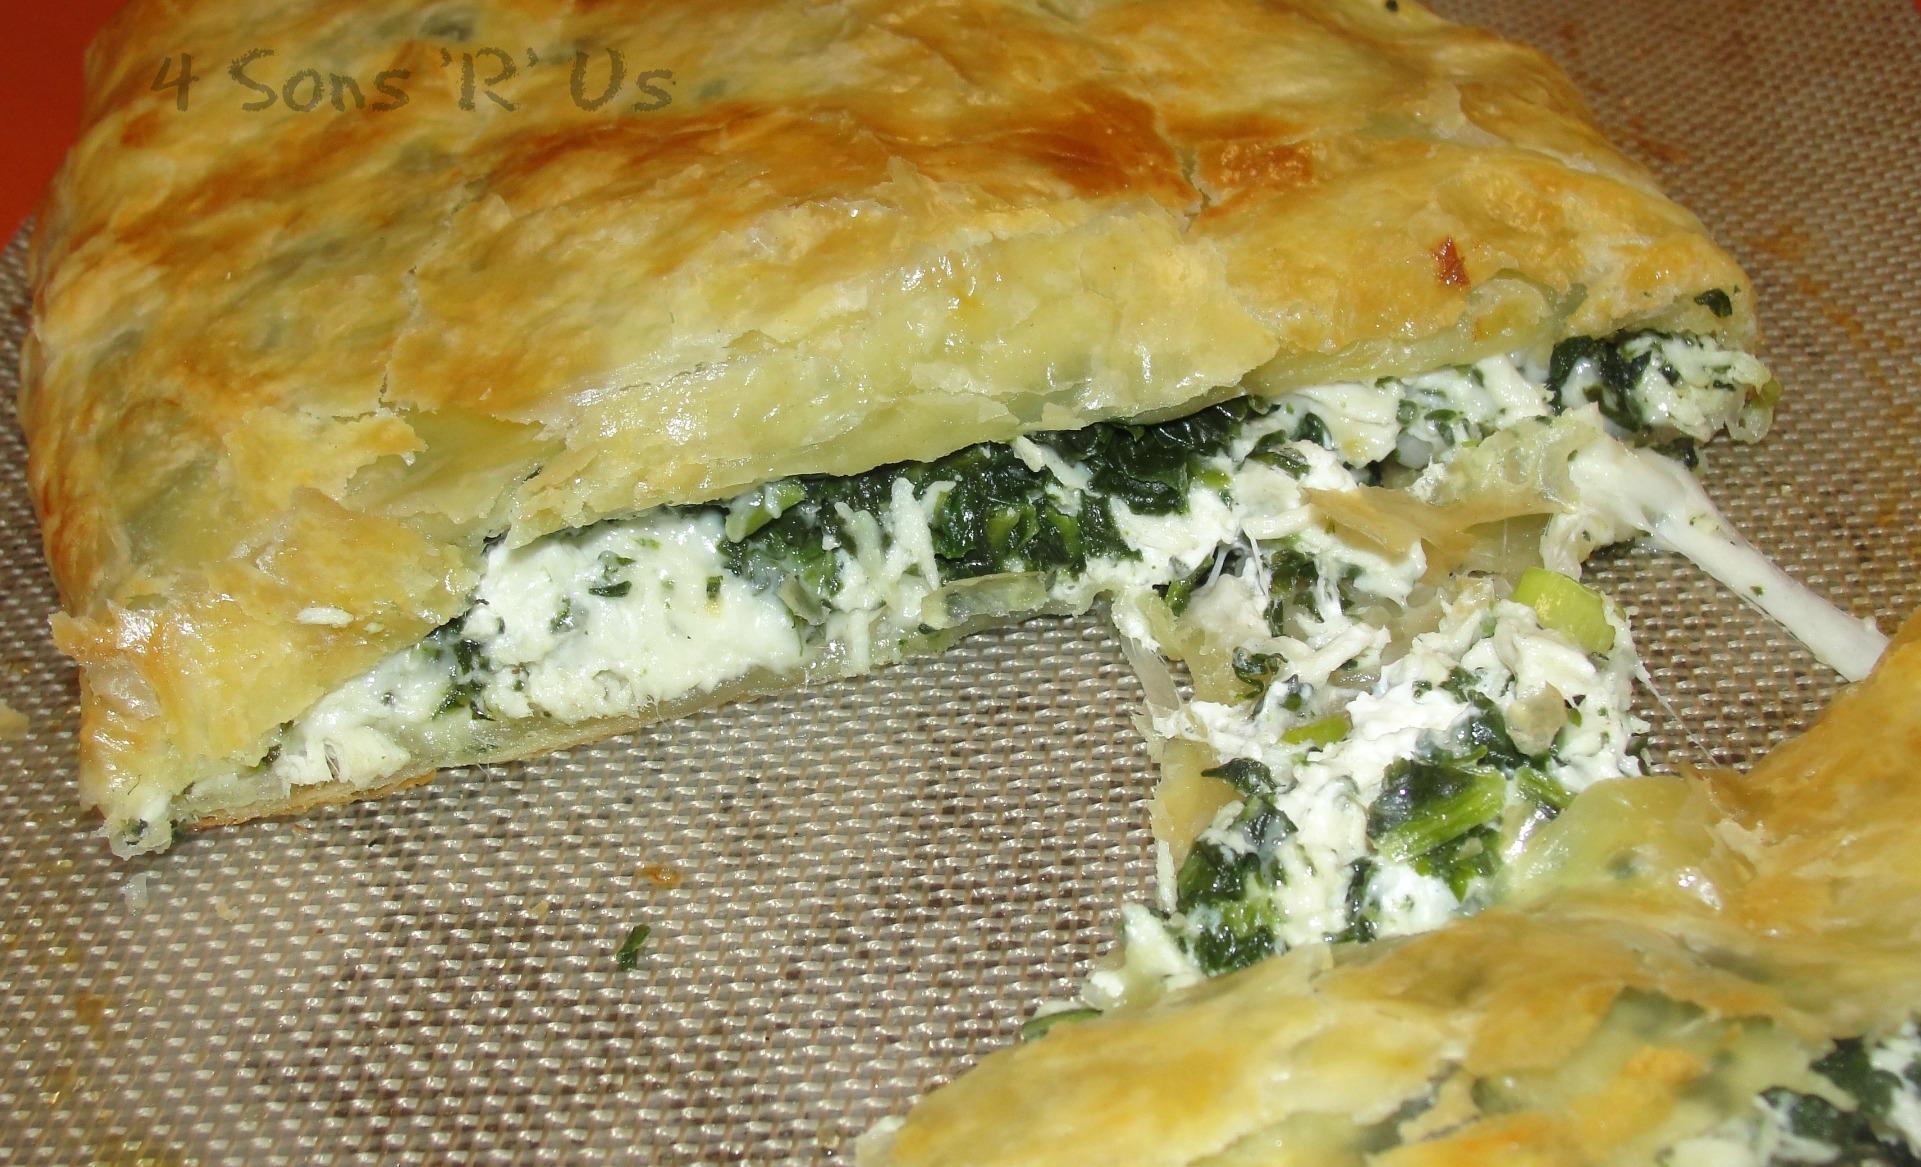 Greek Spinach Feta Chicken Pockets - 4 Sons 'R' Us